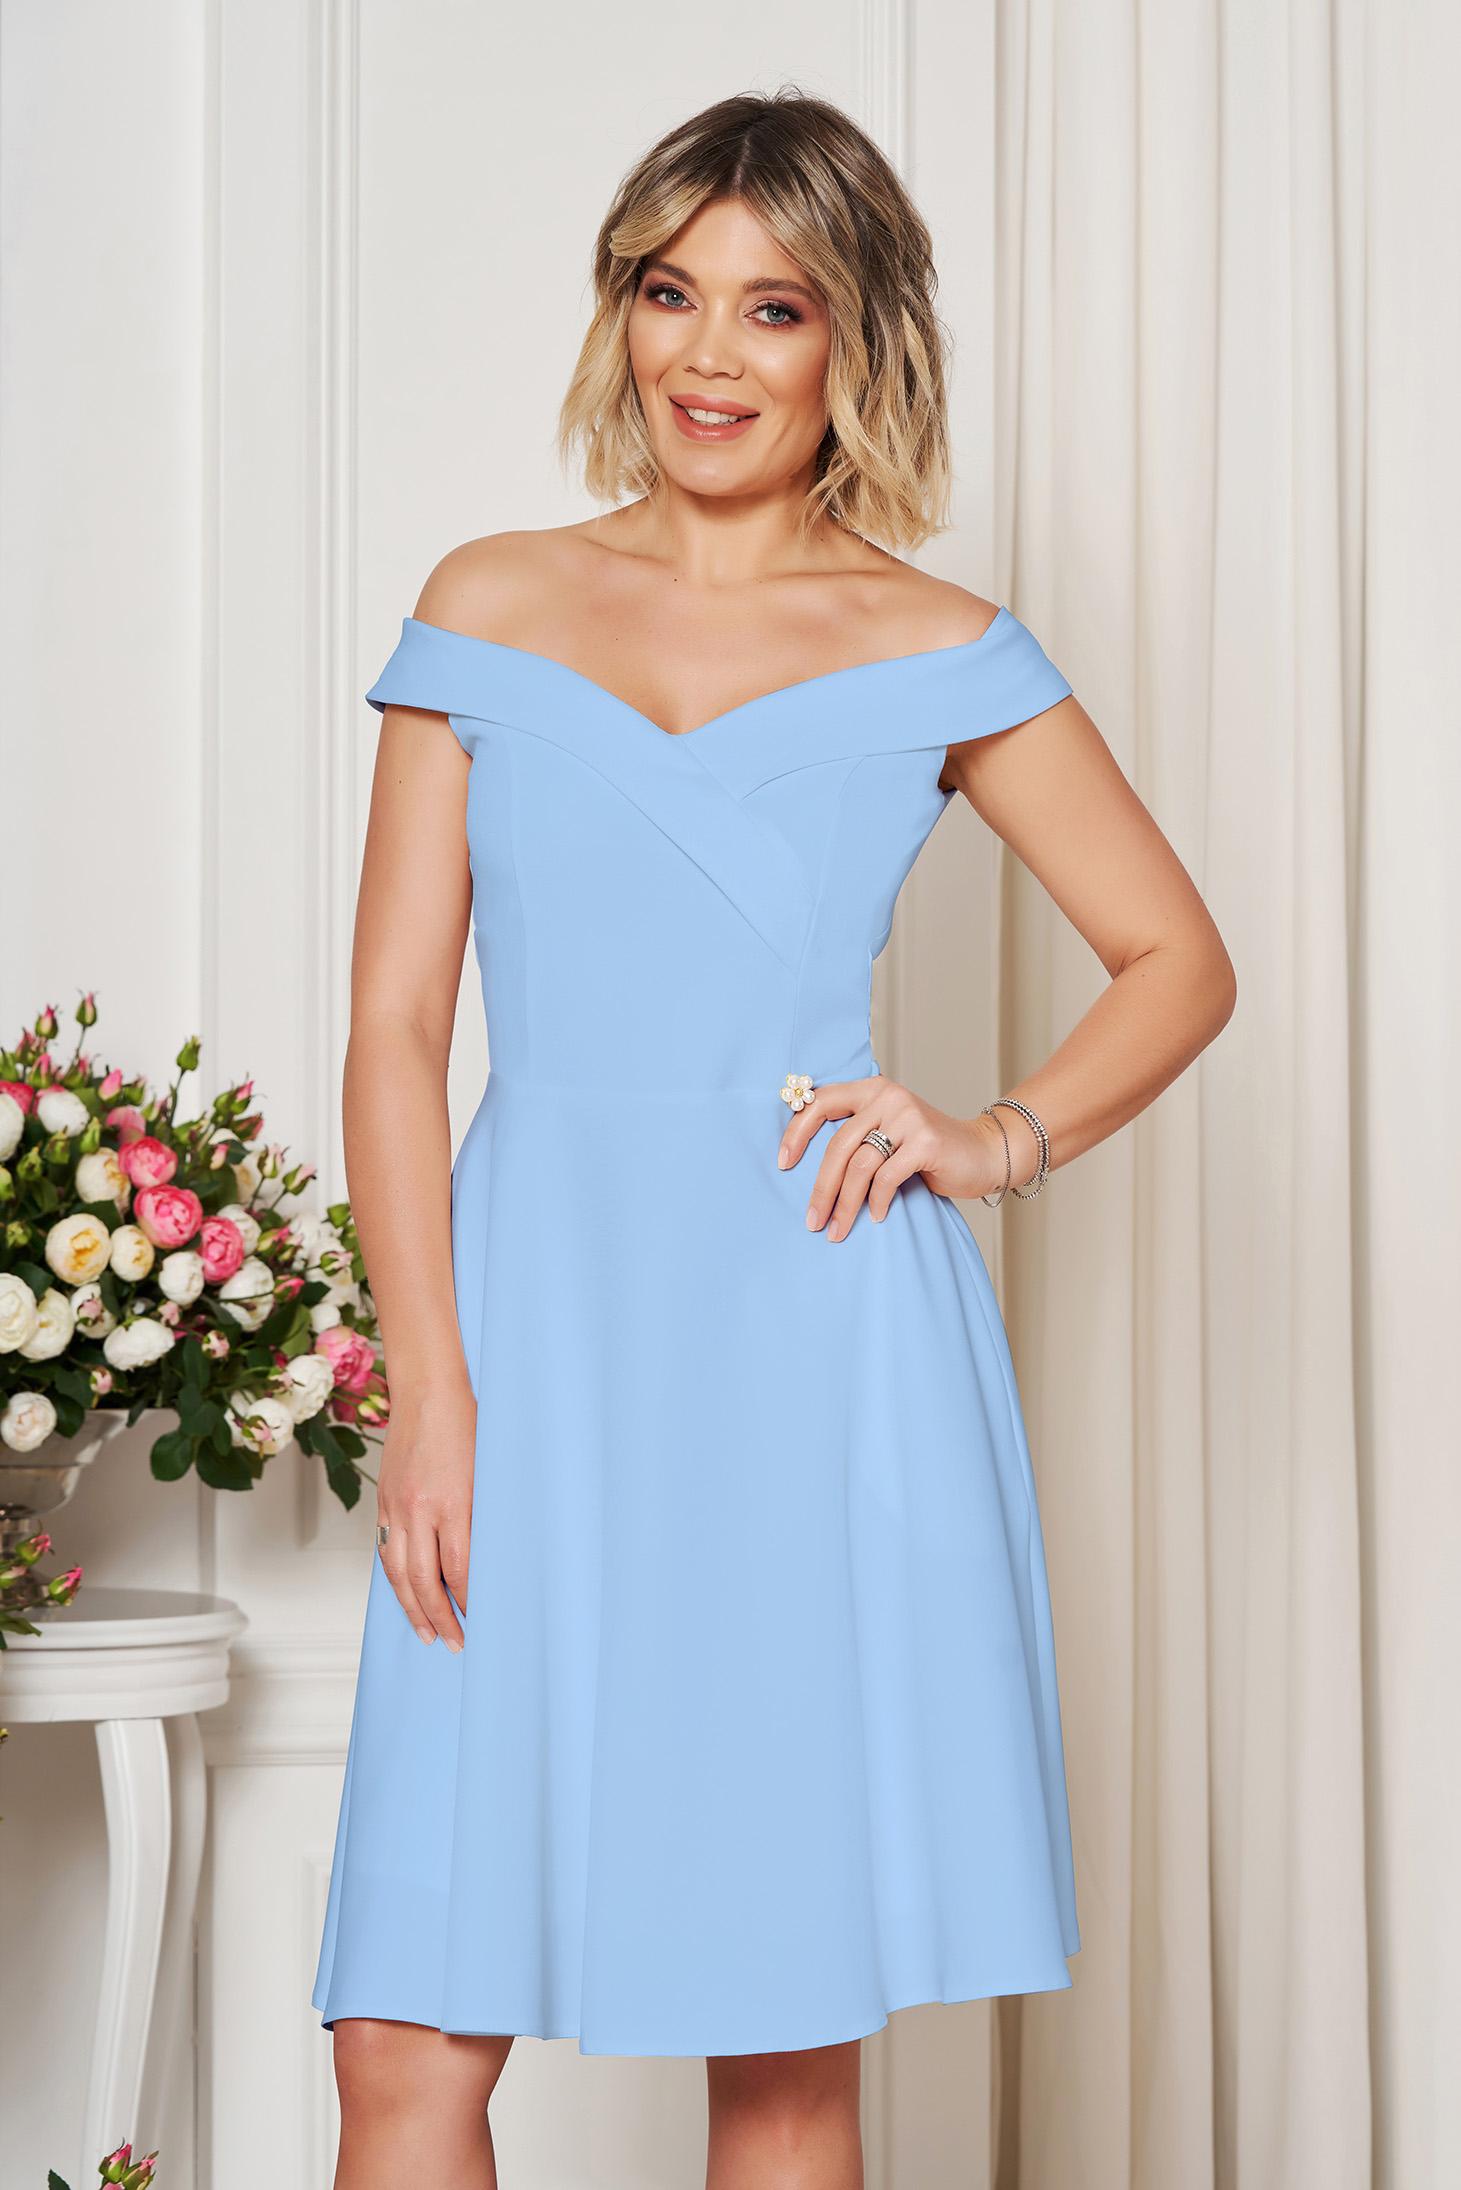 Rochie StarShinerS albastra-deschis de ocazie eleganta in clos cu decolteu cu umeri goi din stofa elastica subtire